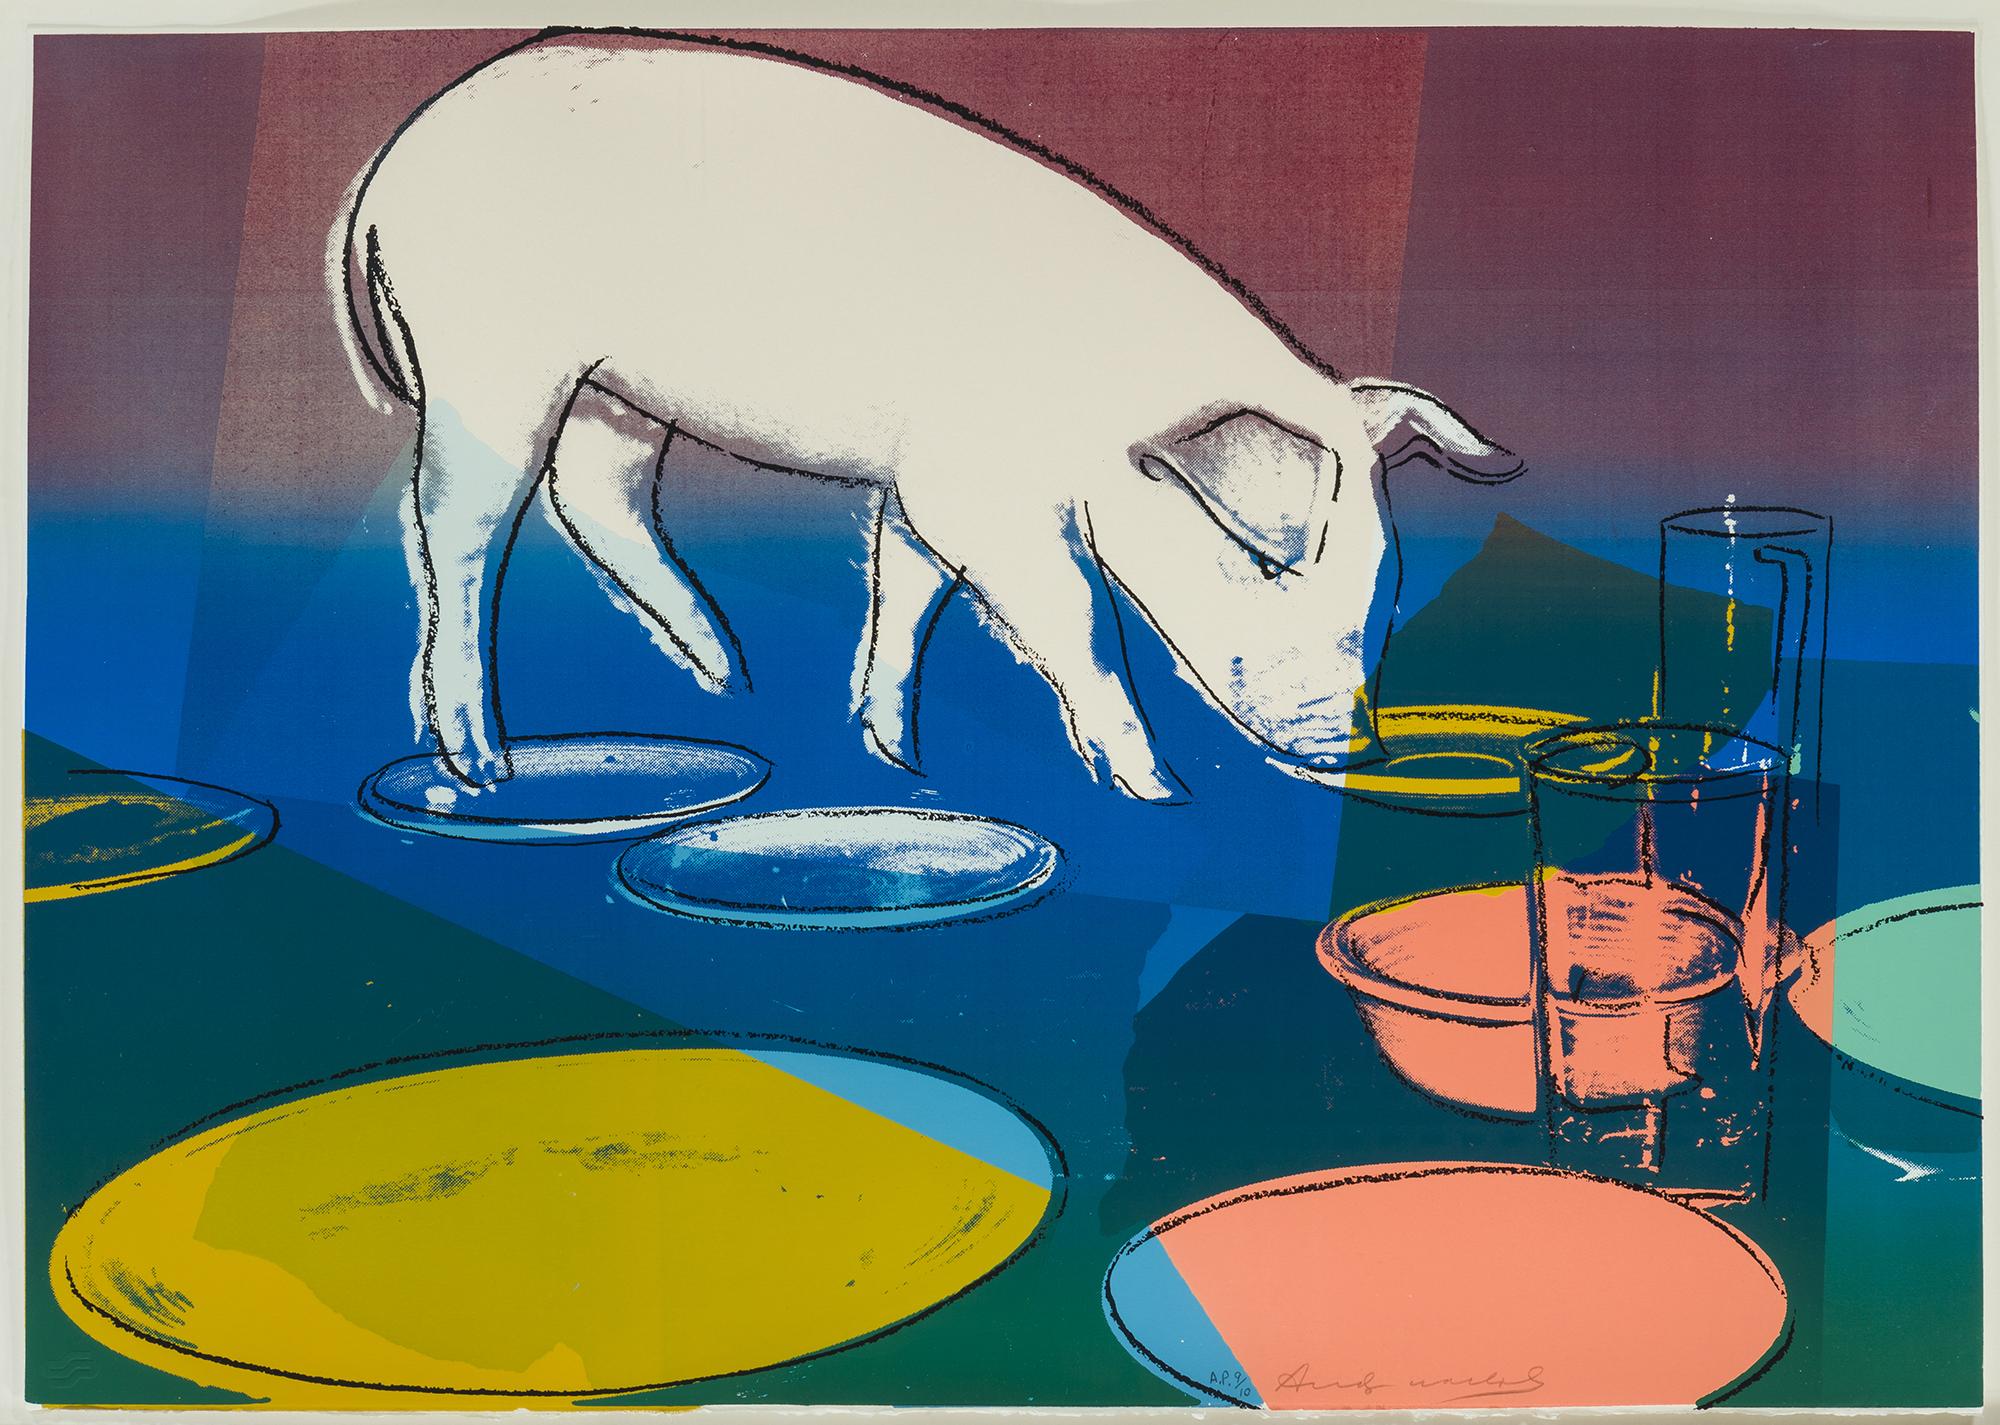 Andy Warhol (1928-1987 New York, NY)